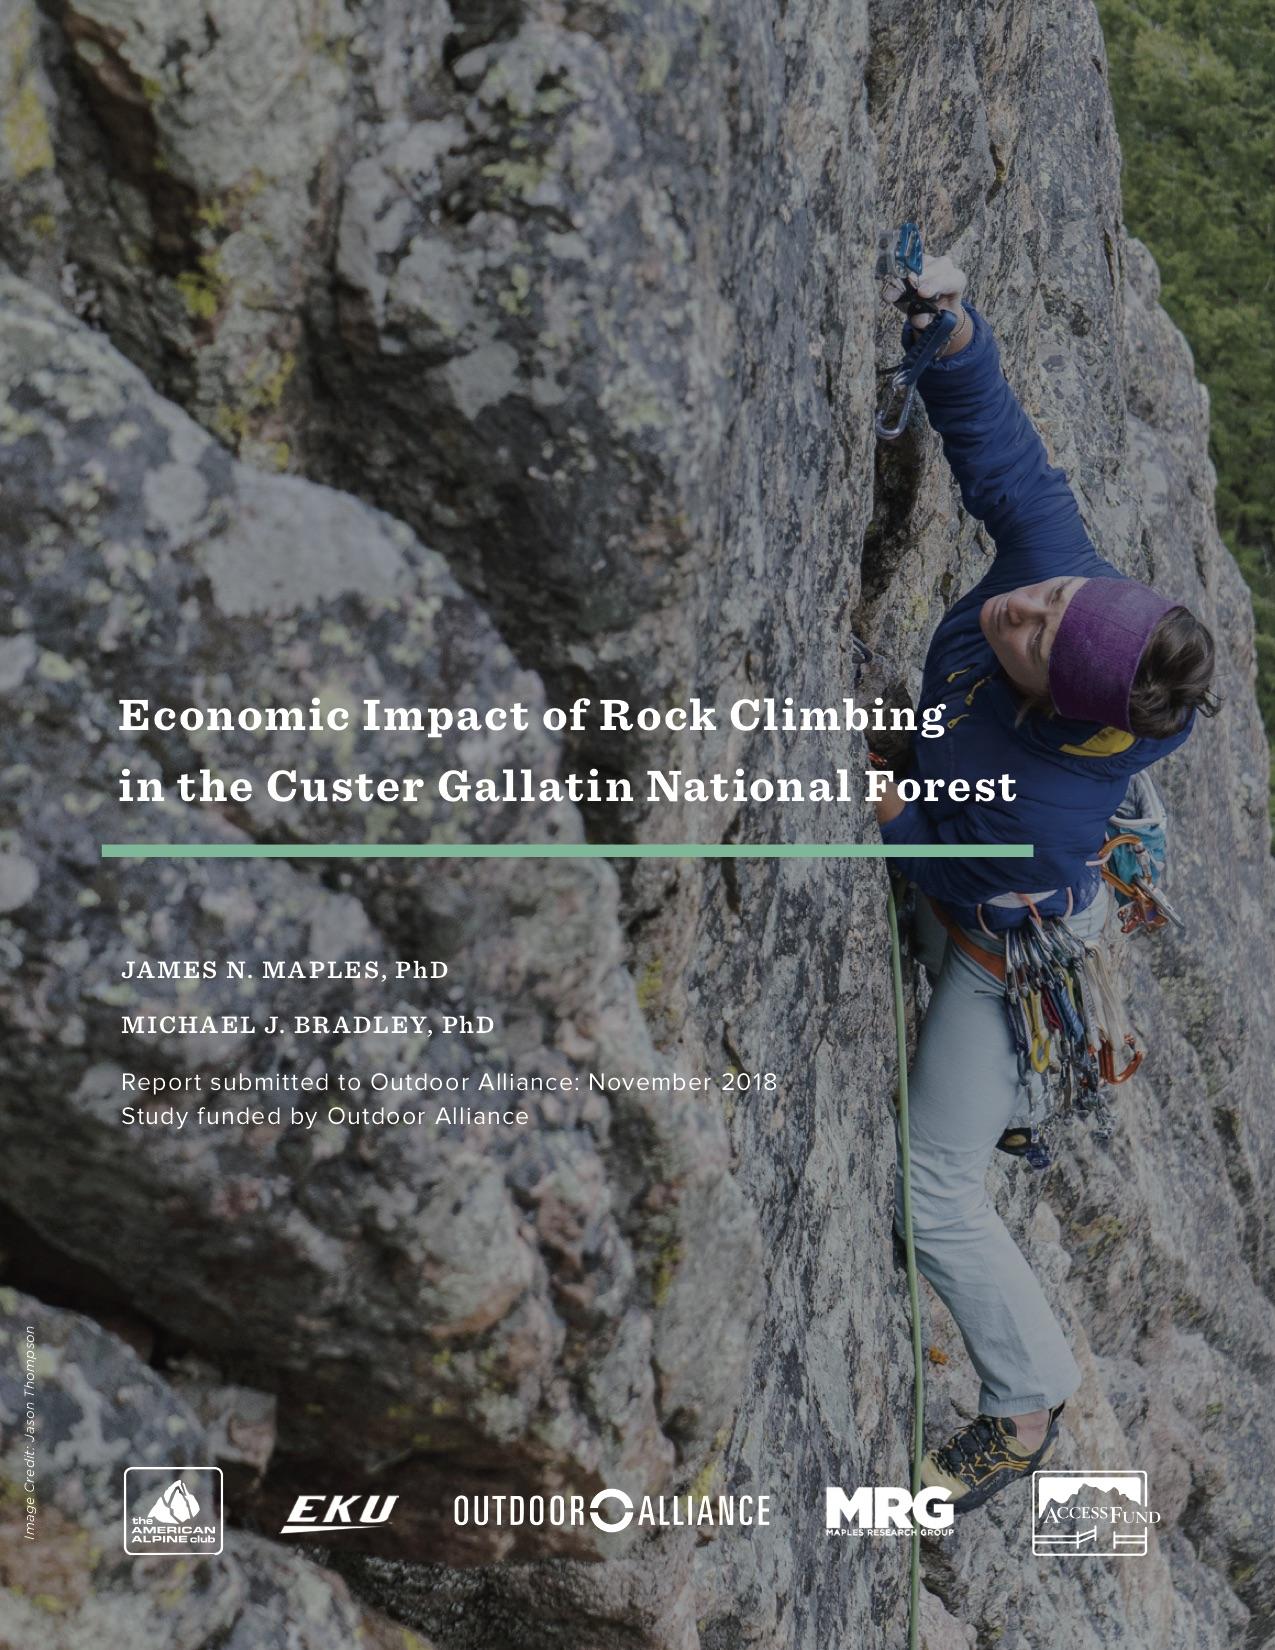 OA_CusterGallatinNF_ClimbingStudy2018 copy.jpg